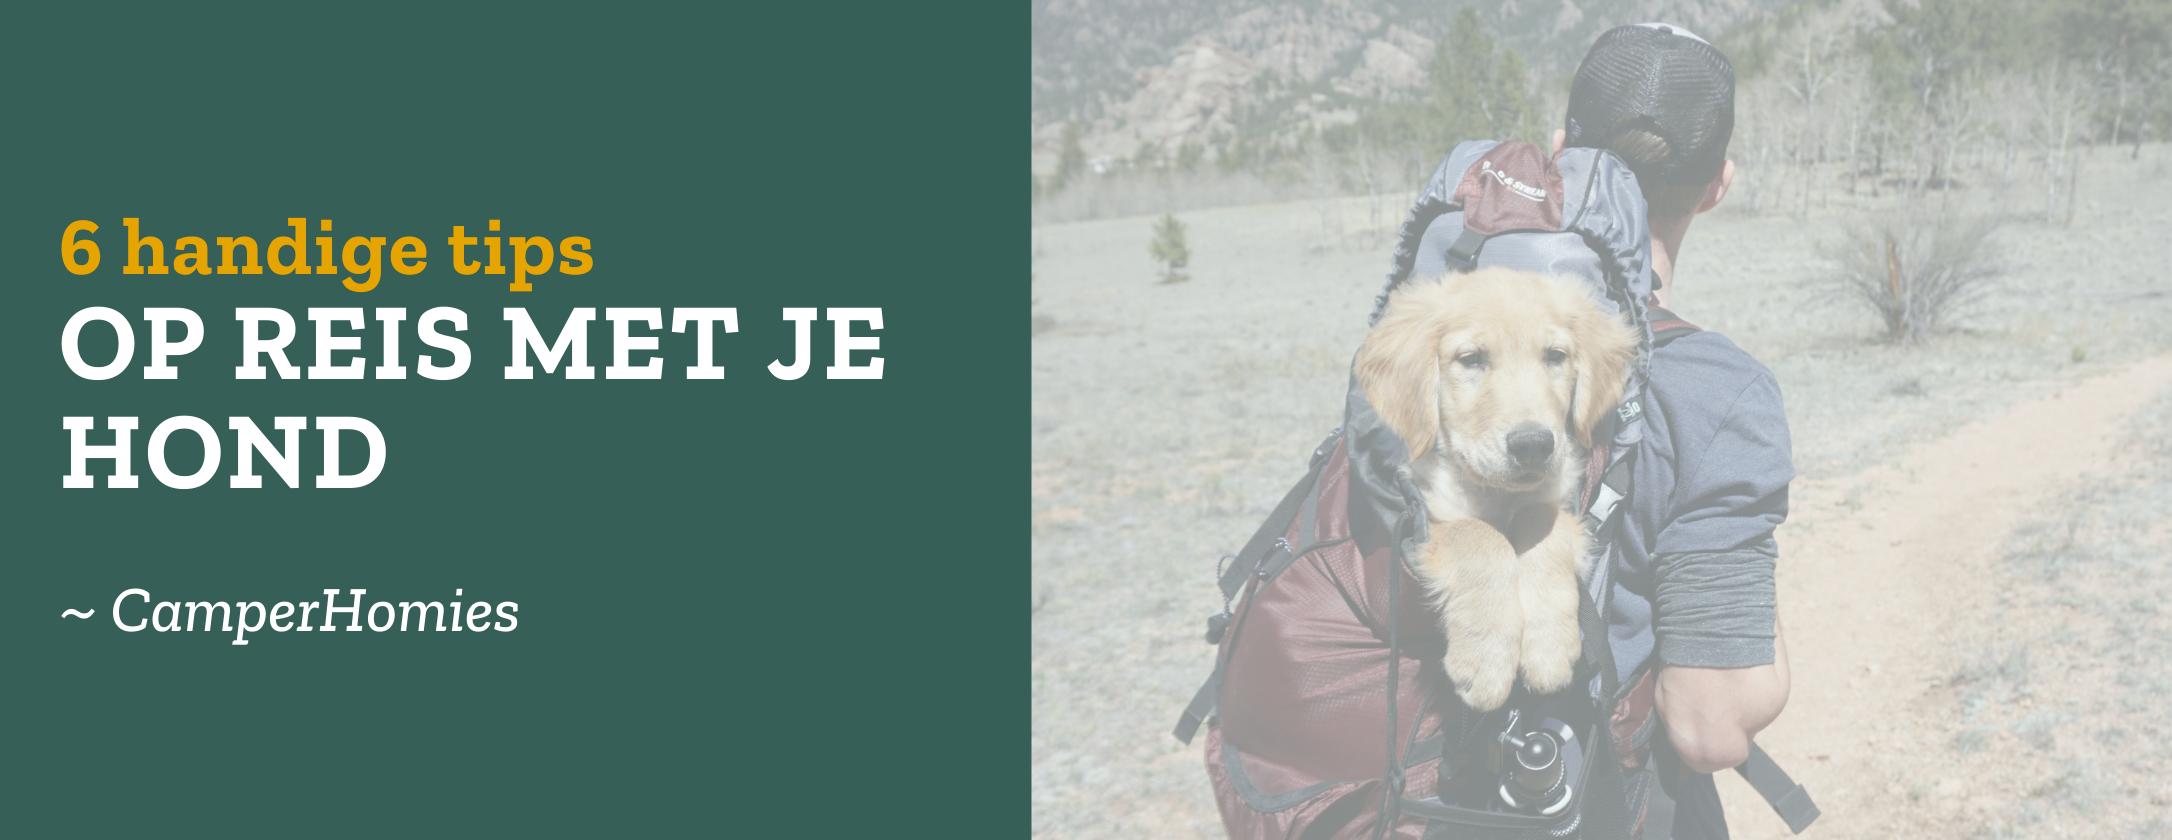 Op reis met je hond - 6 handige tips